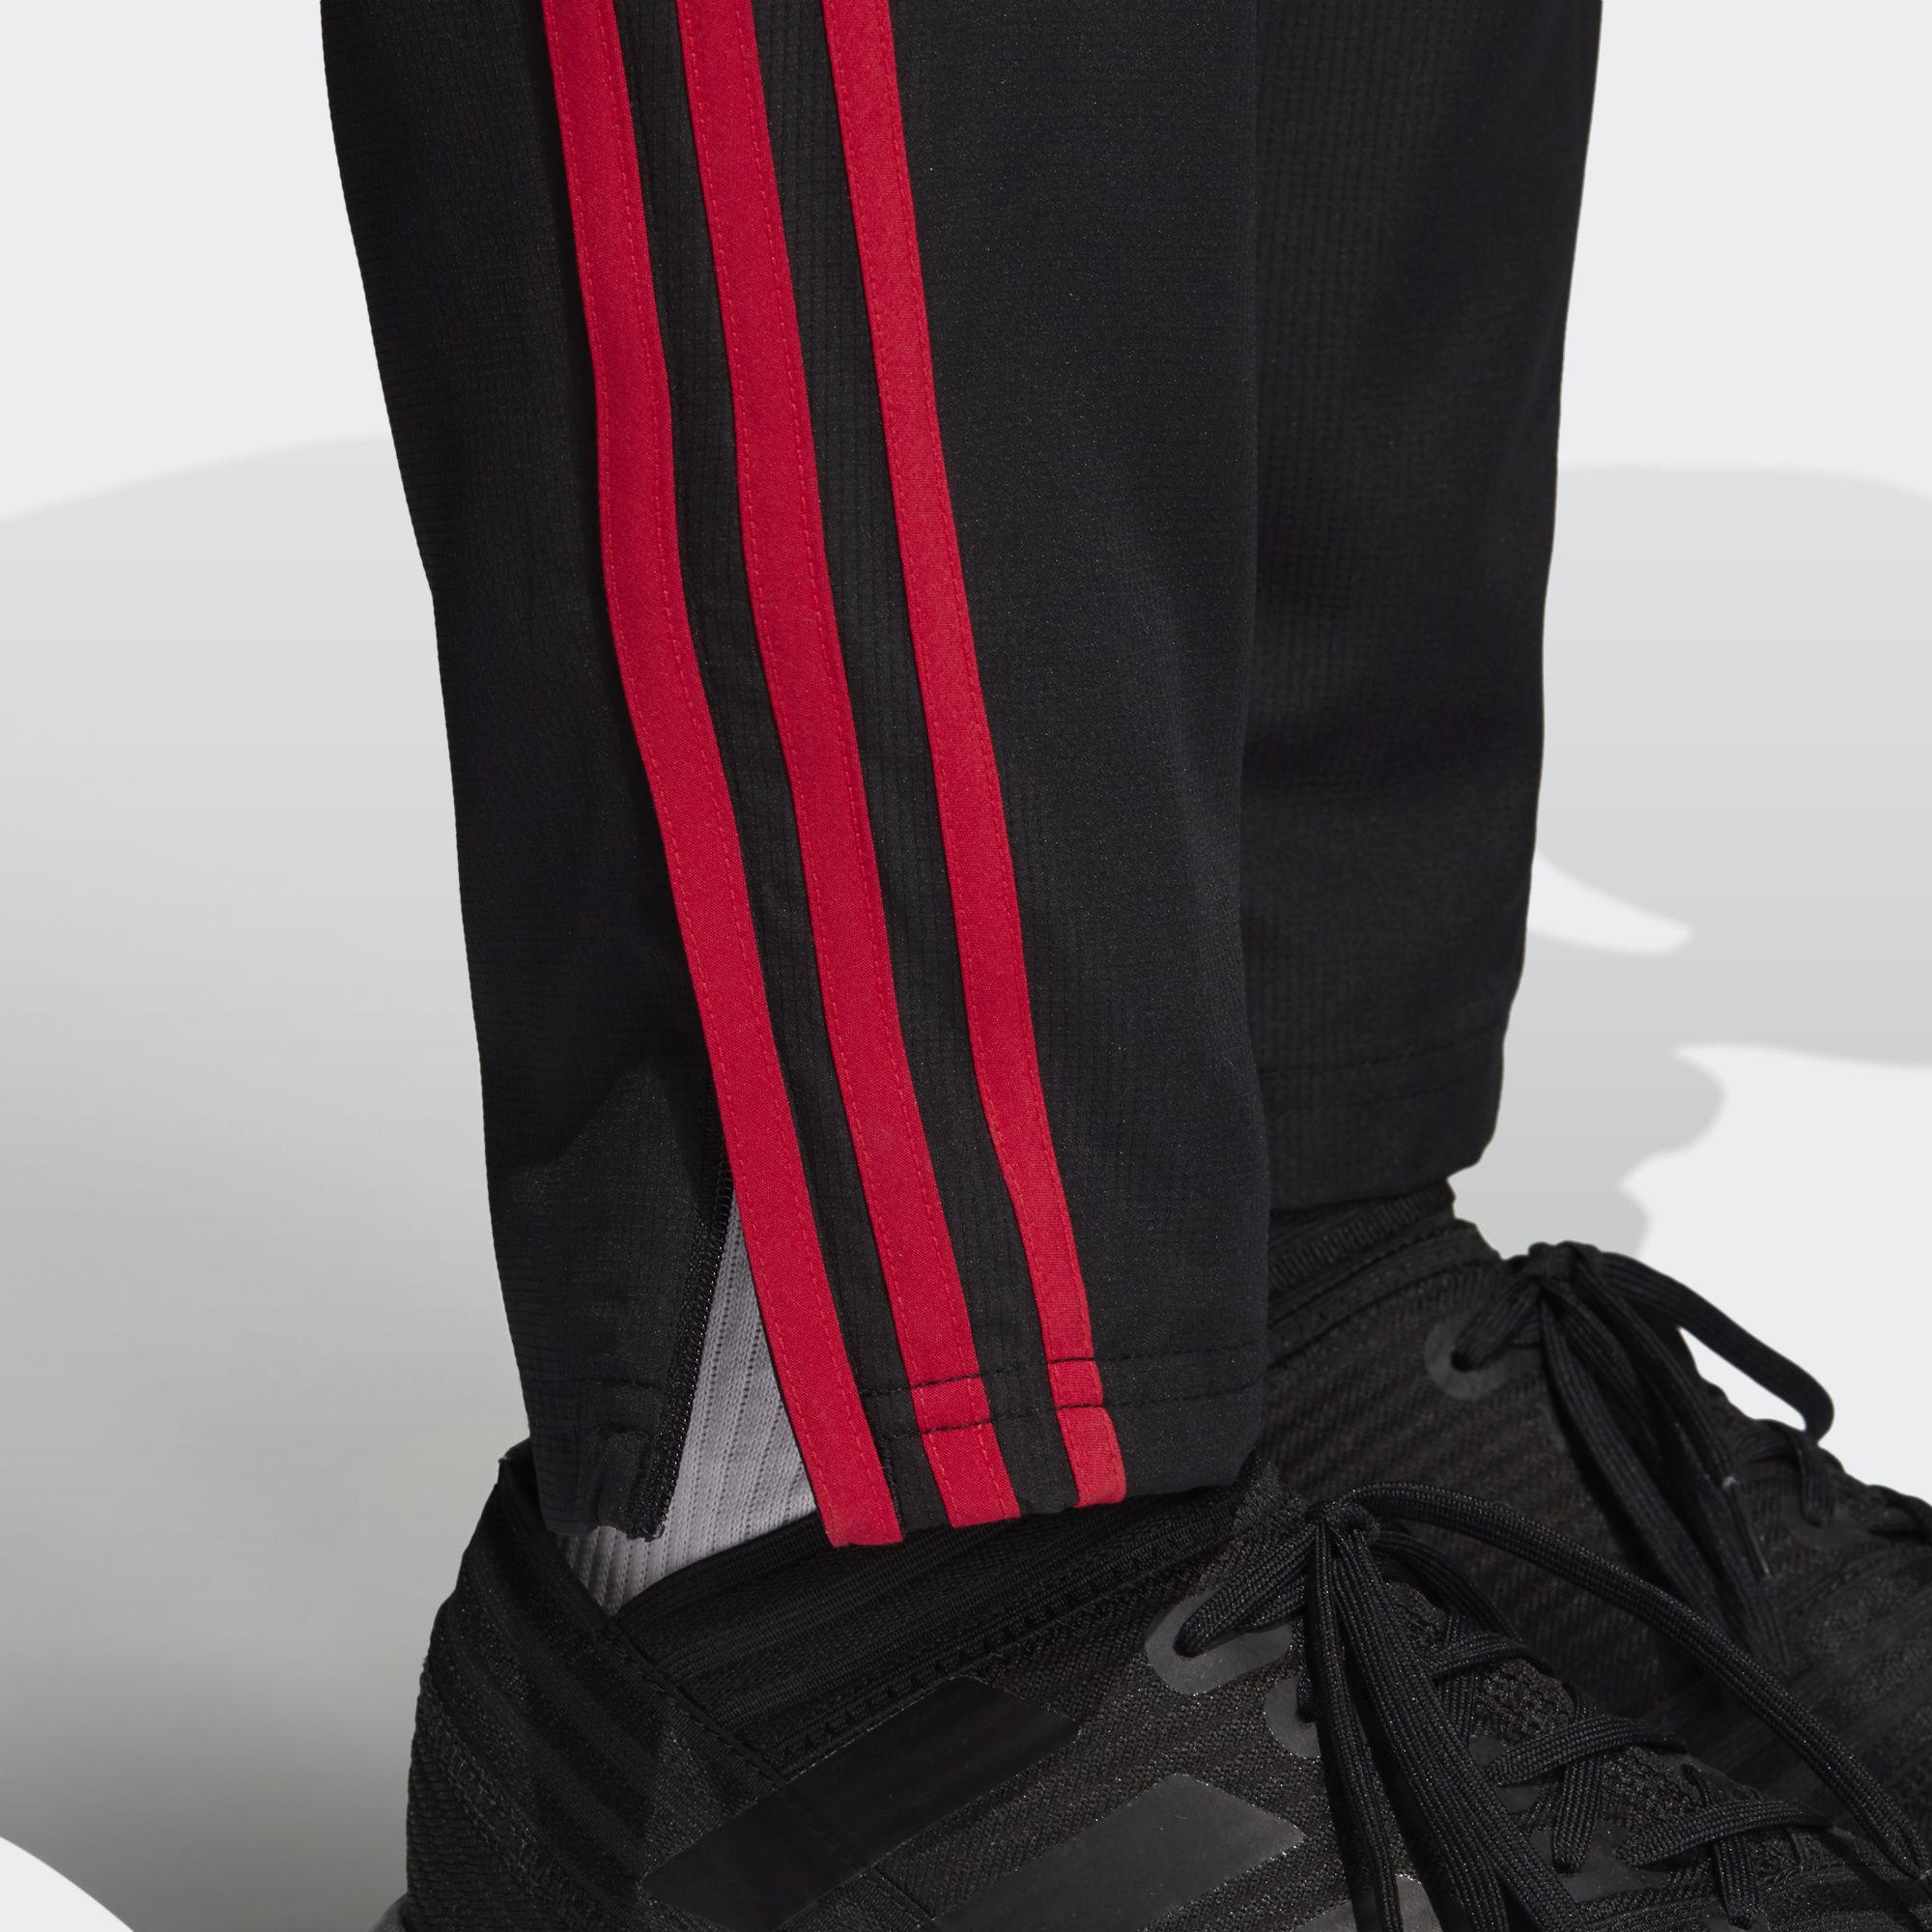 e7b54554de42 Брюки Манчестер Юнайтед Downtime CW7633 adidas Performance - Украина ...